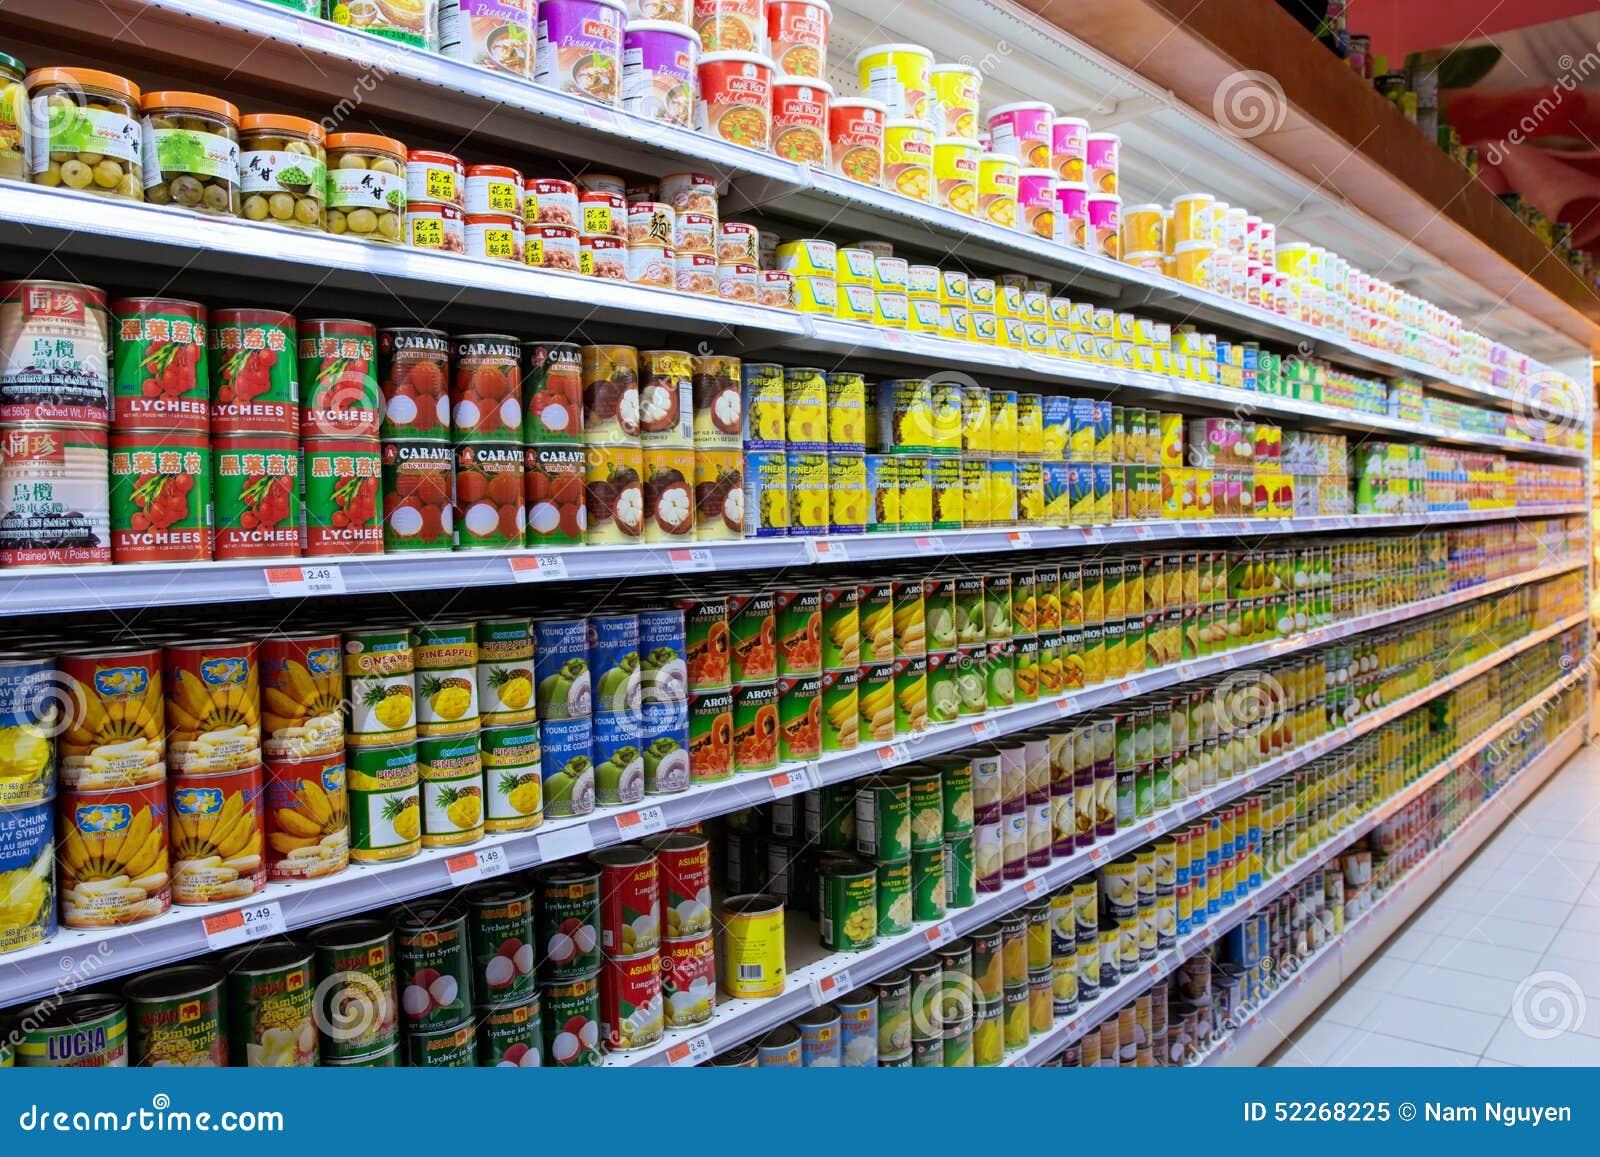 Food Market Aisles